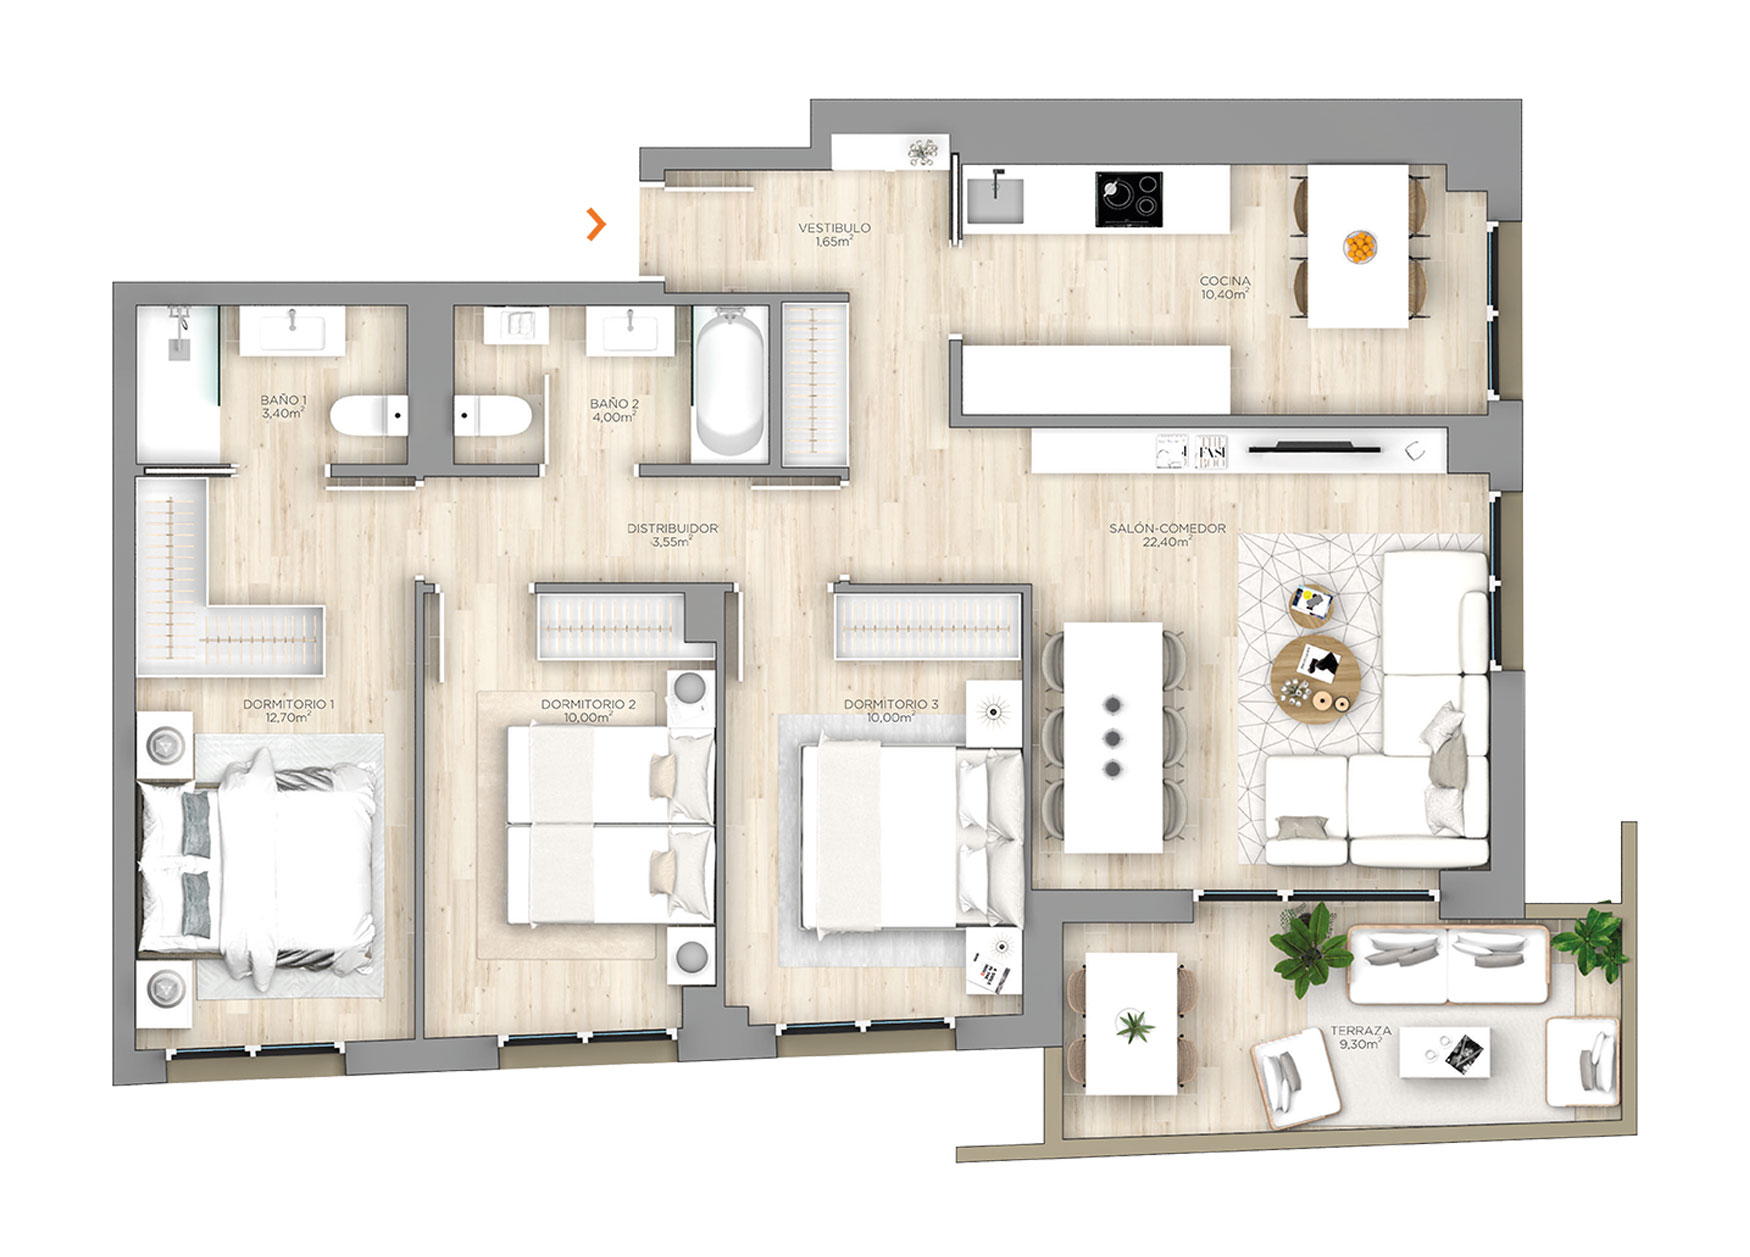 Arrosadia-construcciones-andia_AF_PLANO-PLANTA-1AL6B-1